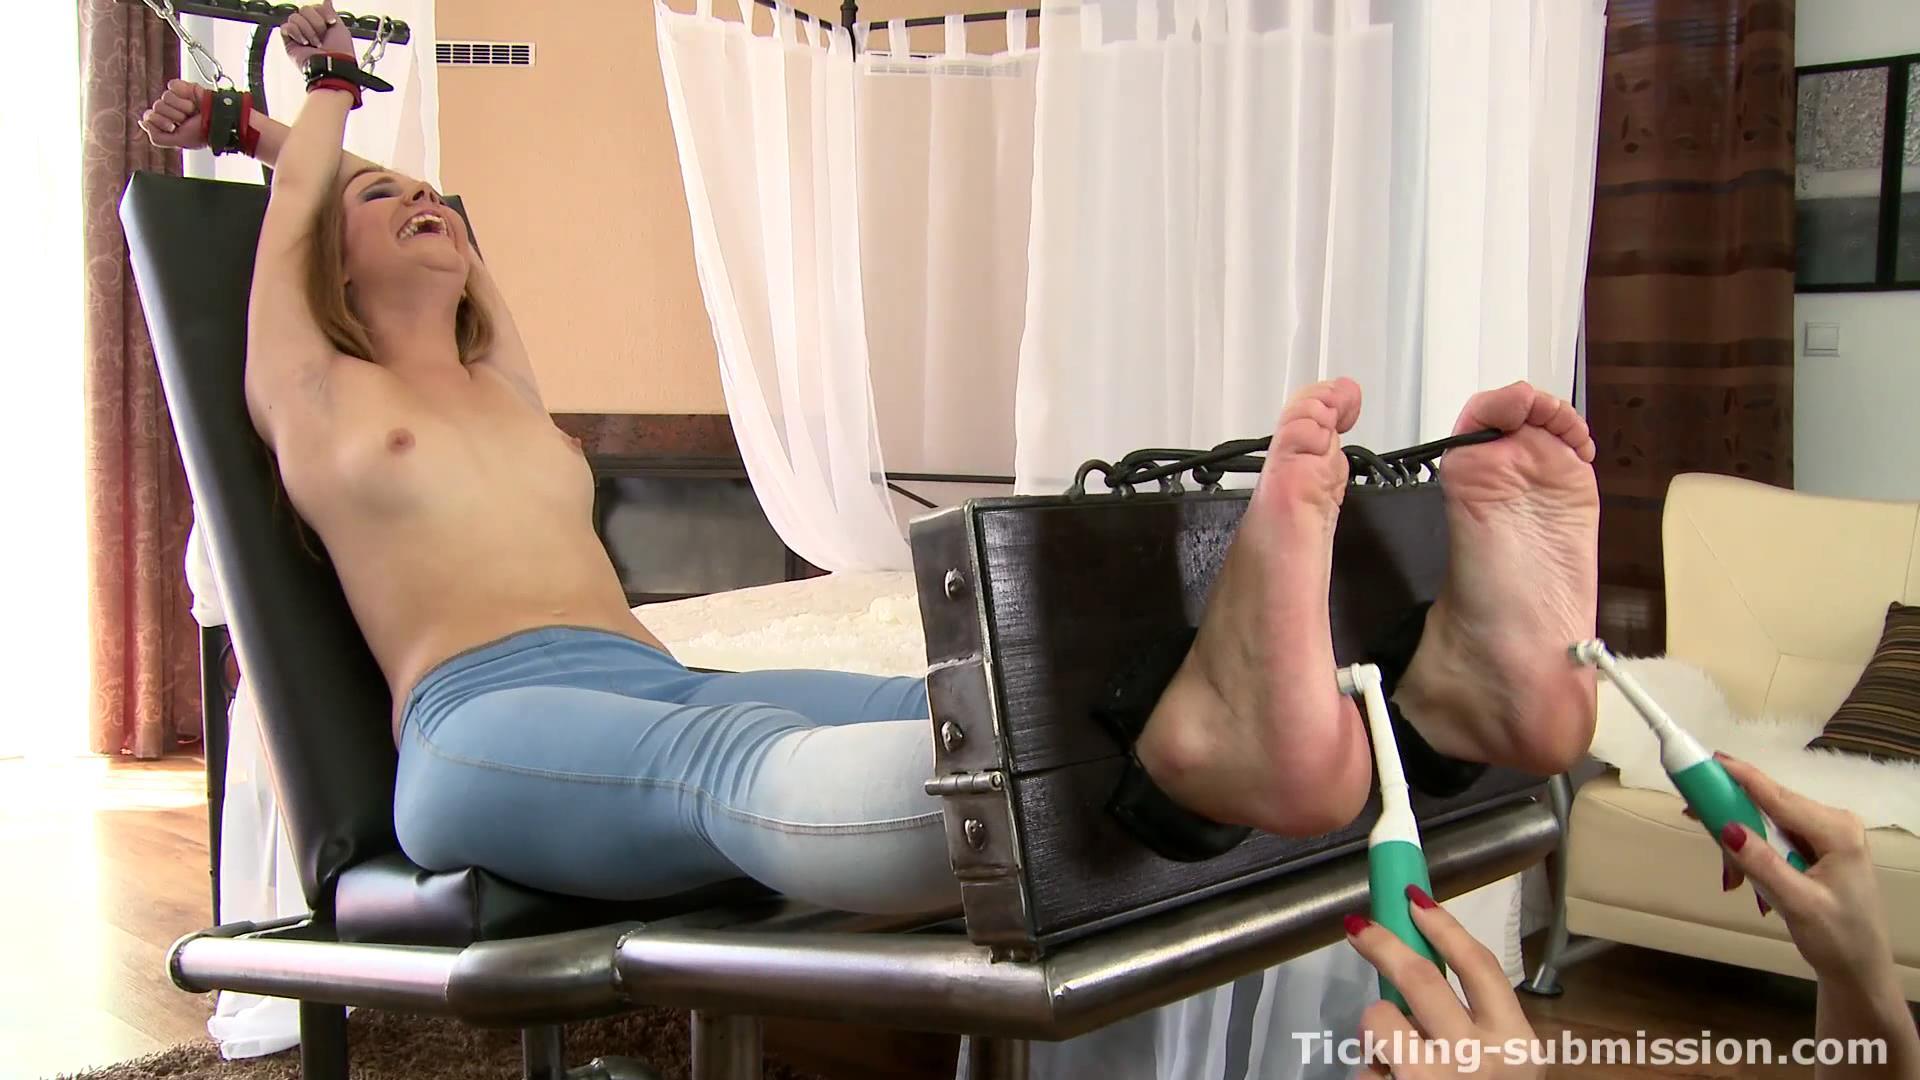 Extra ticklish feet by milf lorena 5